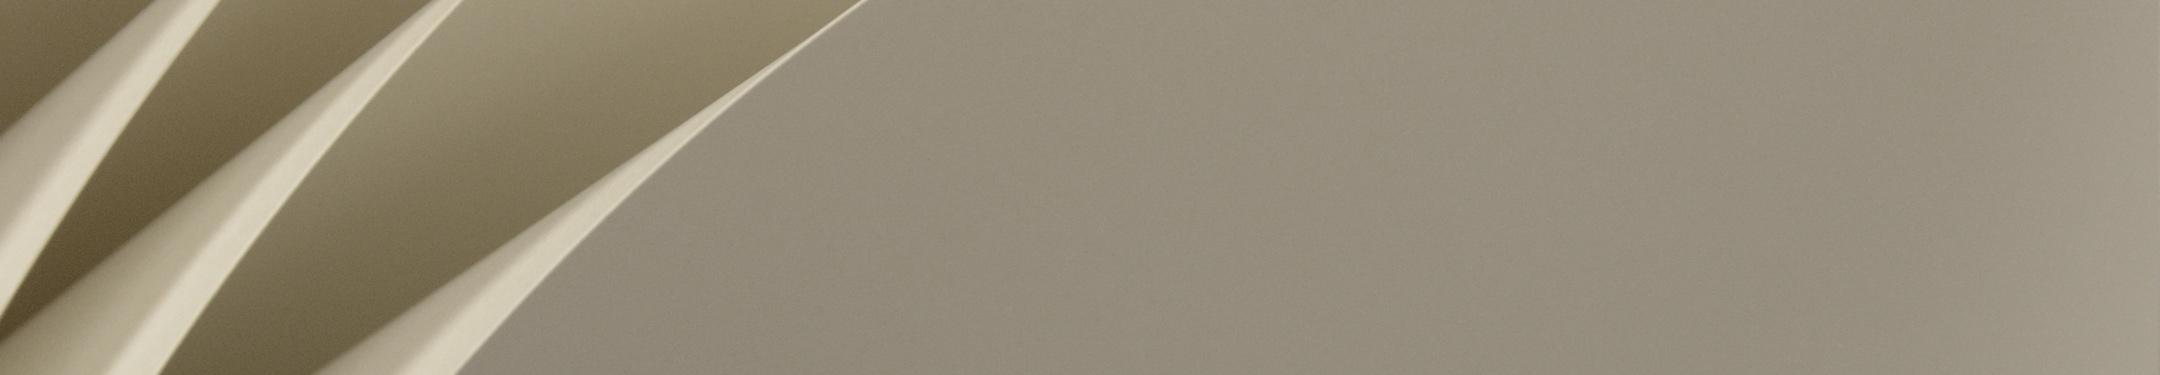 Finch Fine Color Copier